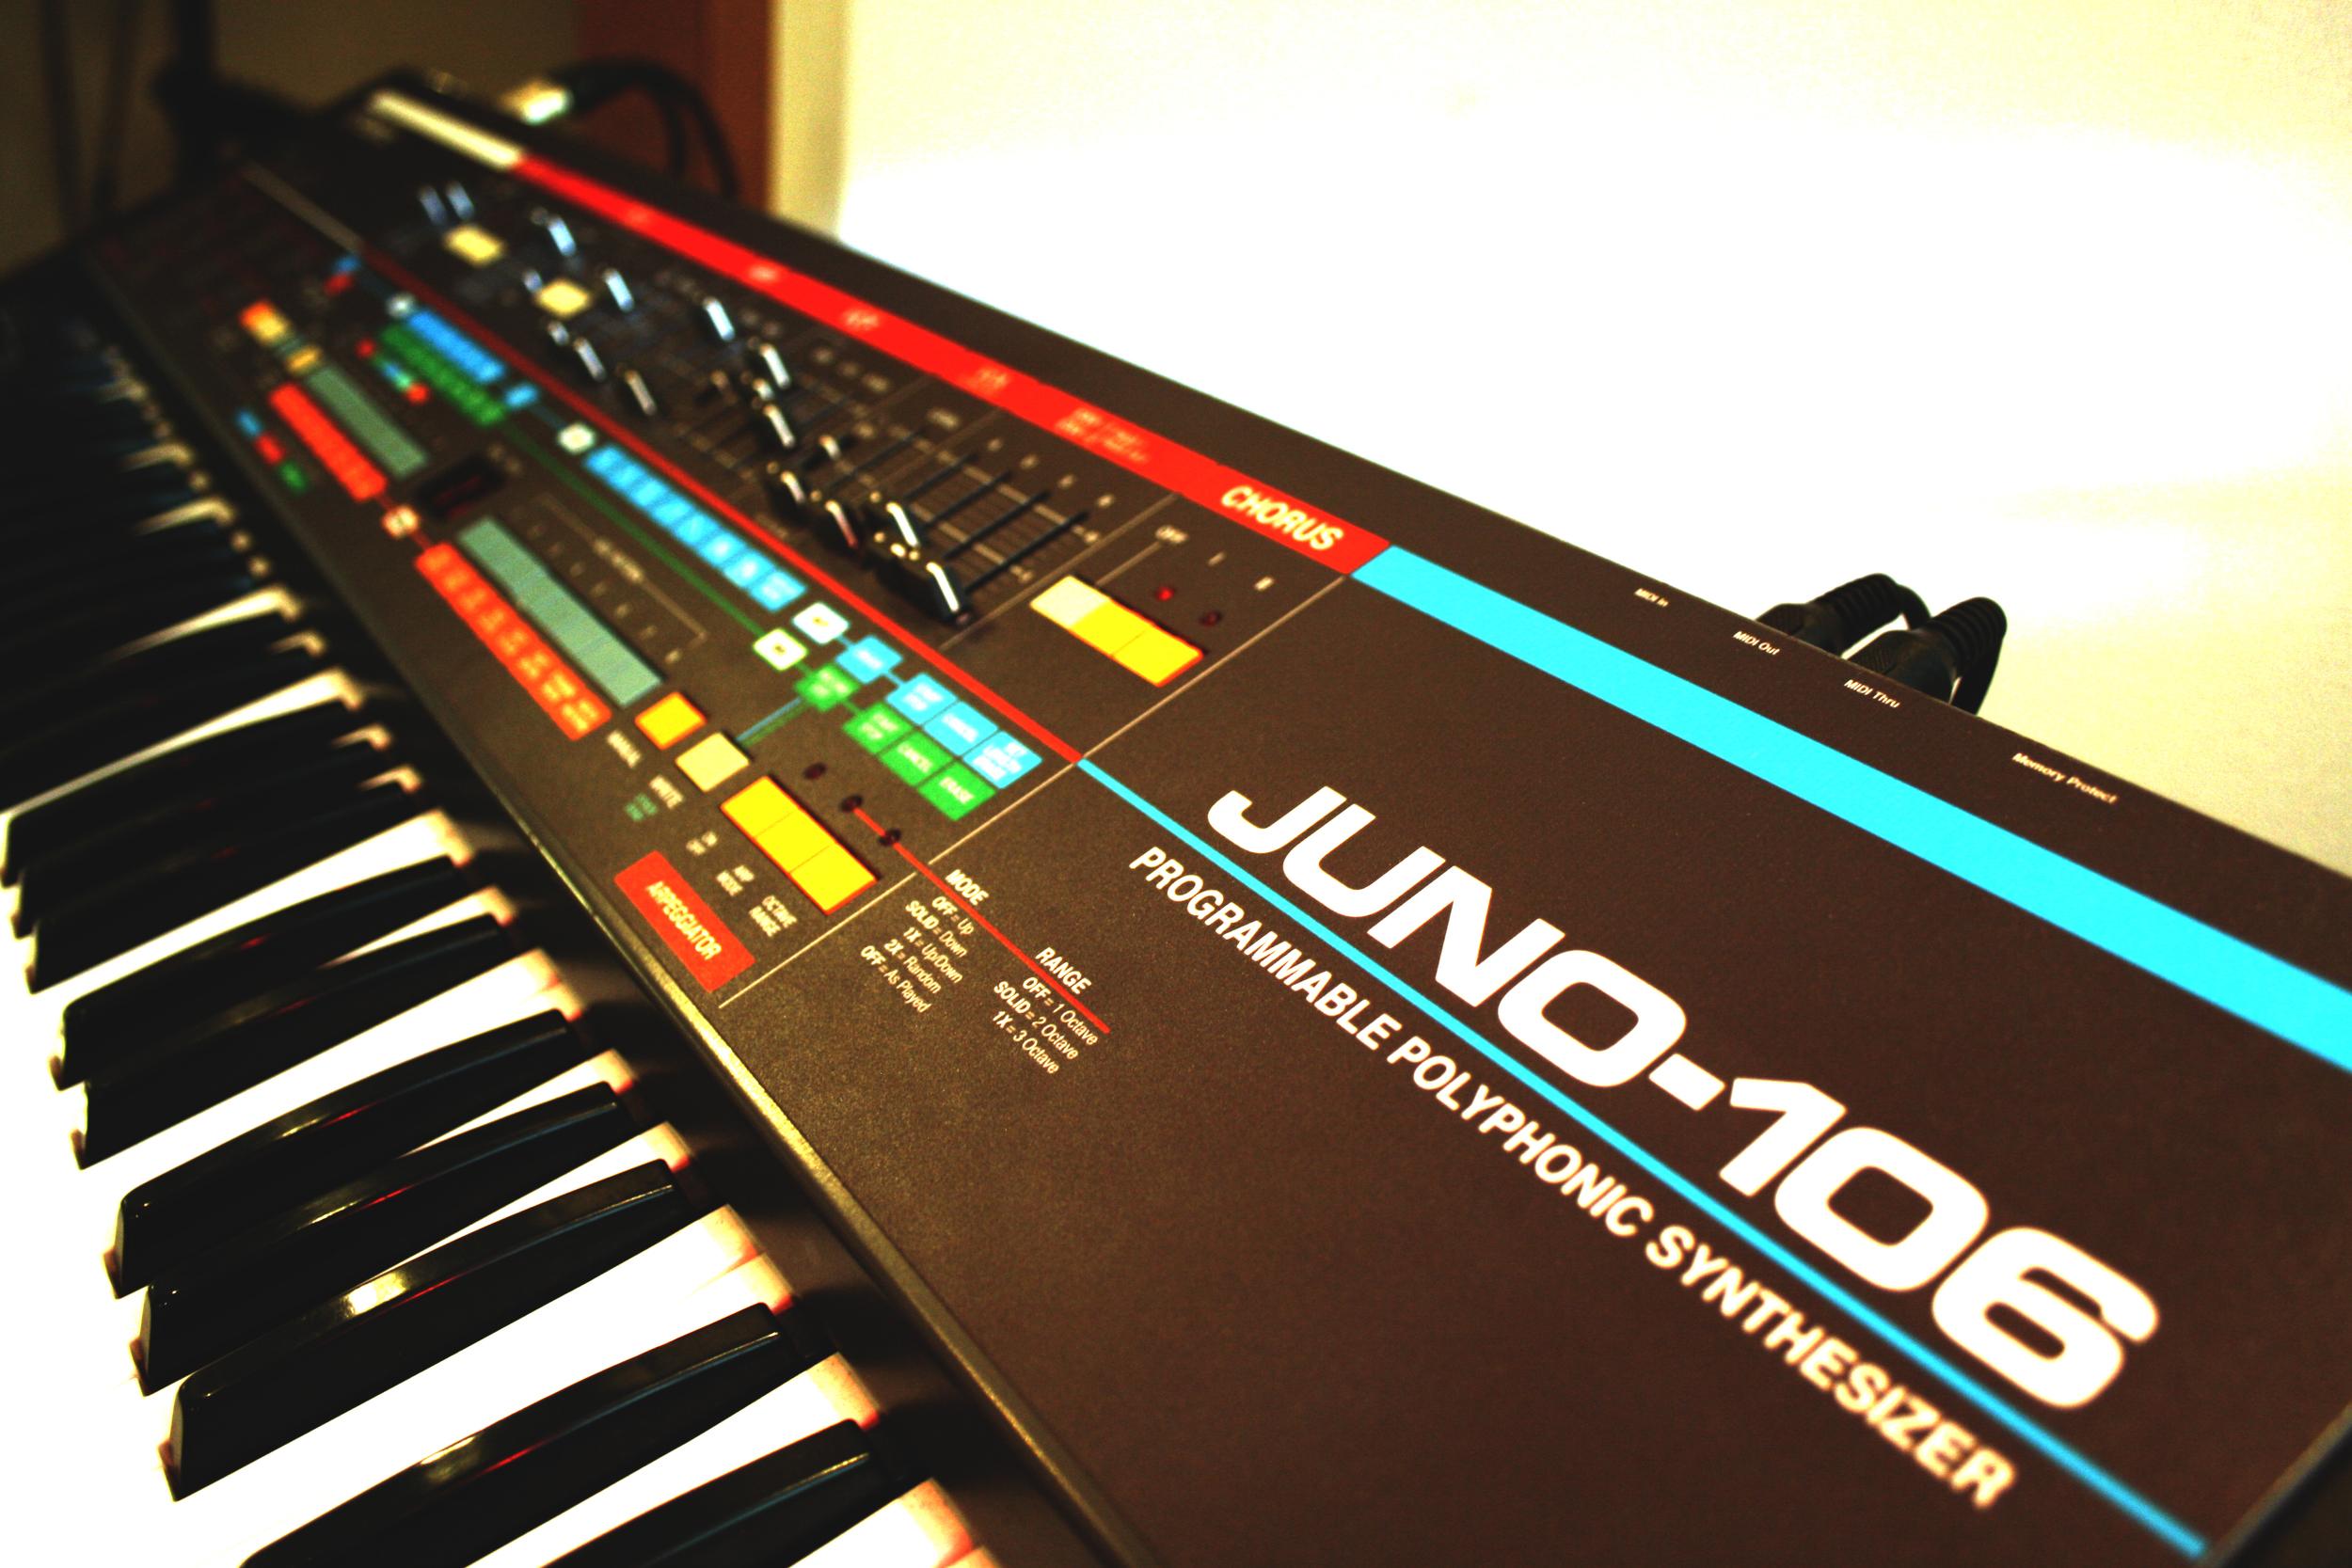 Juno_106_Photoshop_2.jpg